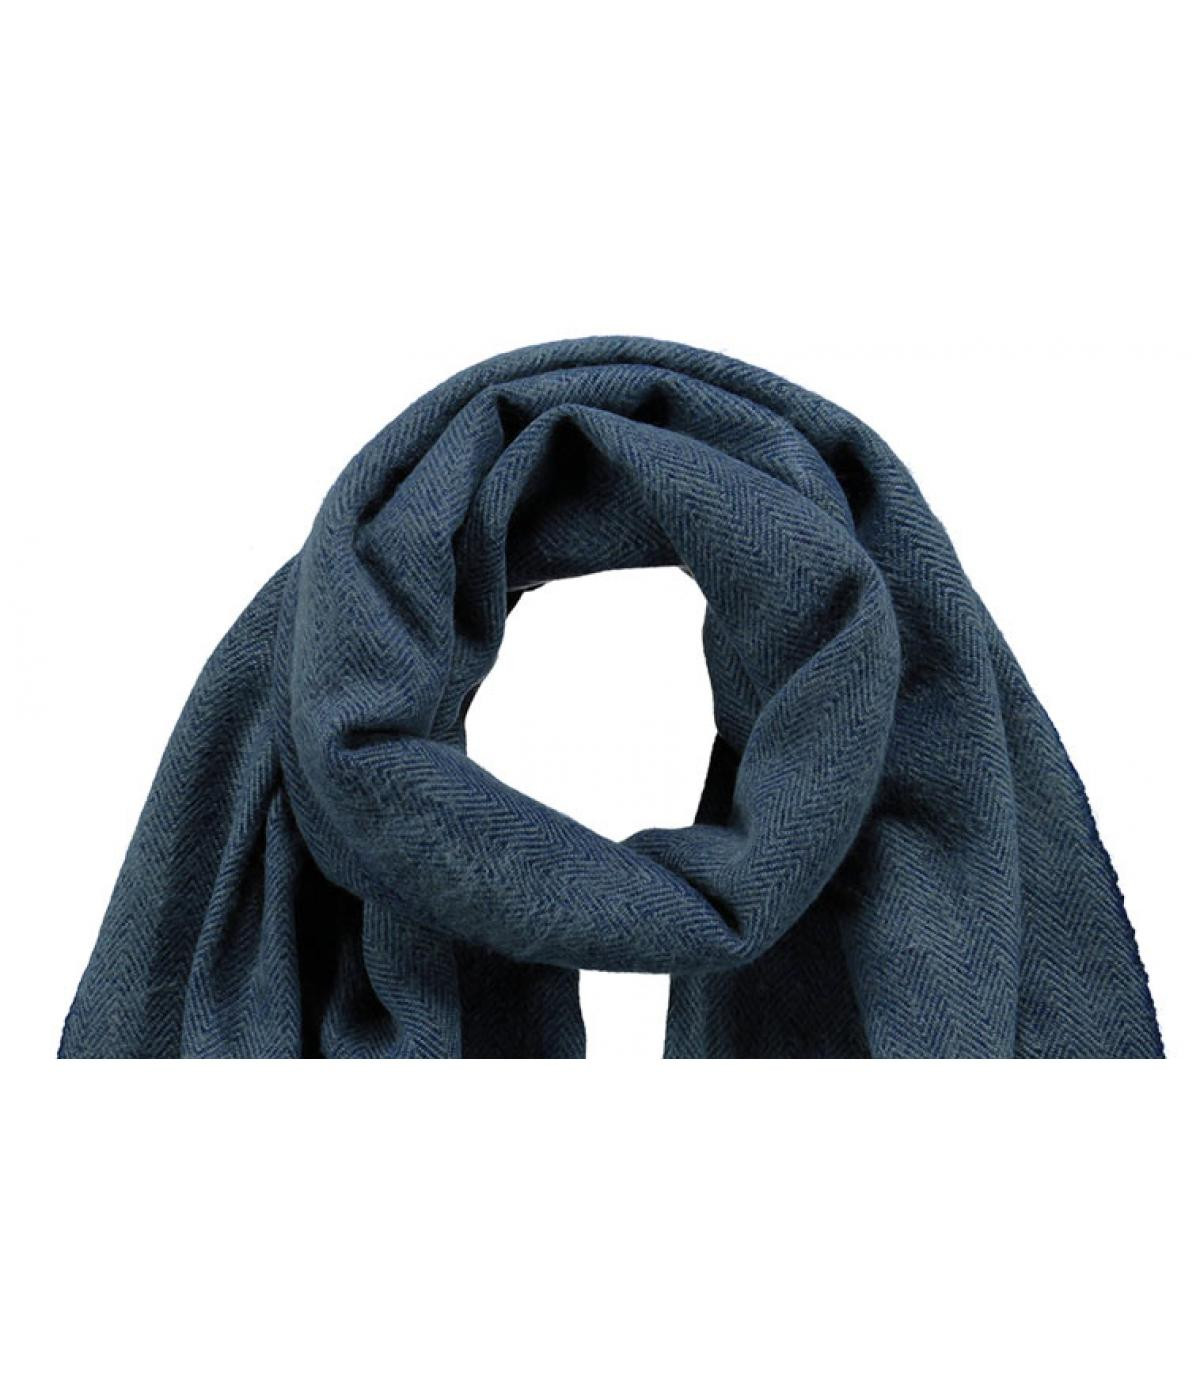 Detalles Soho scarf navy imagen 2